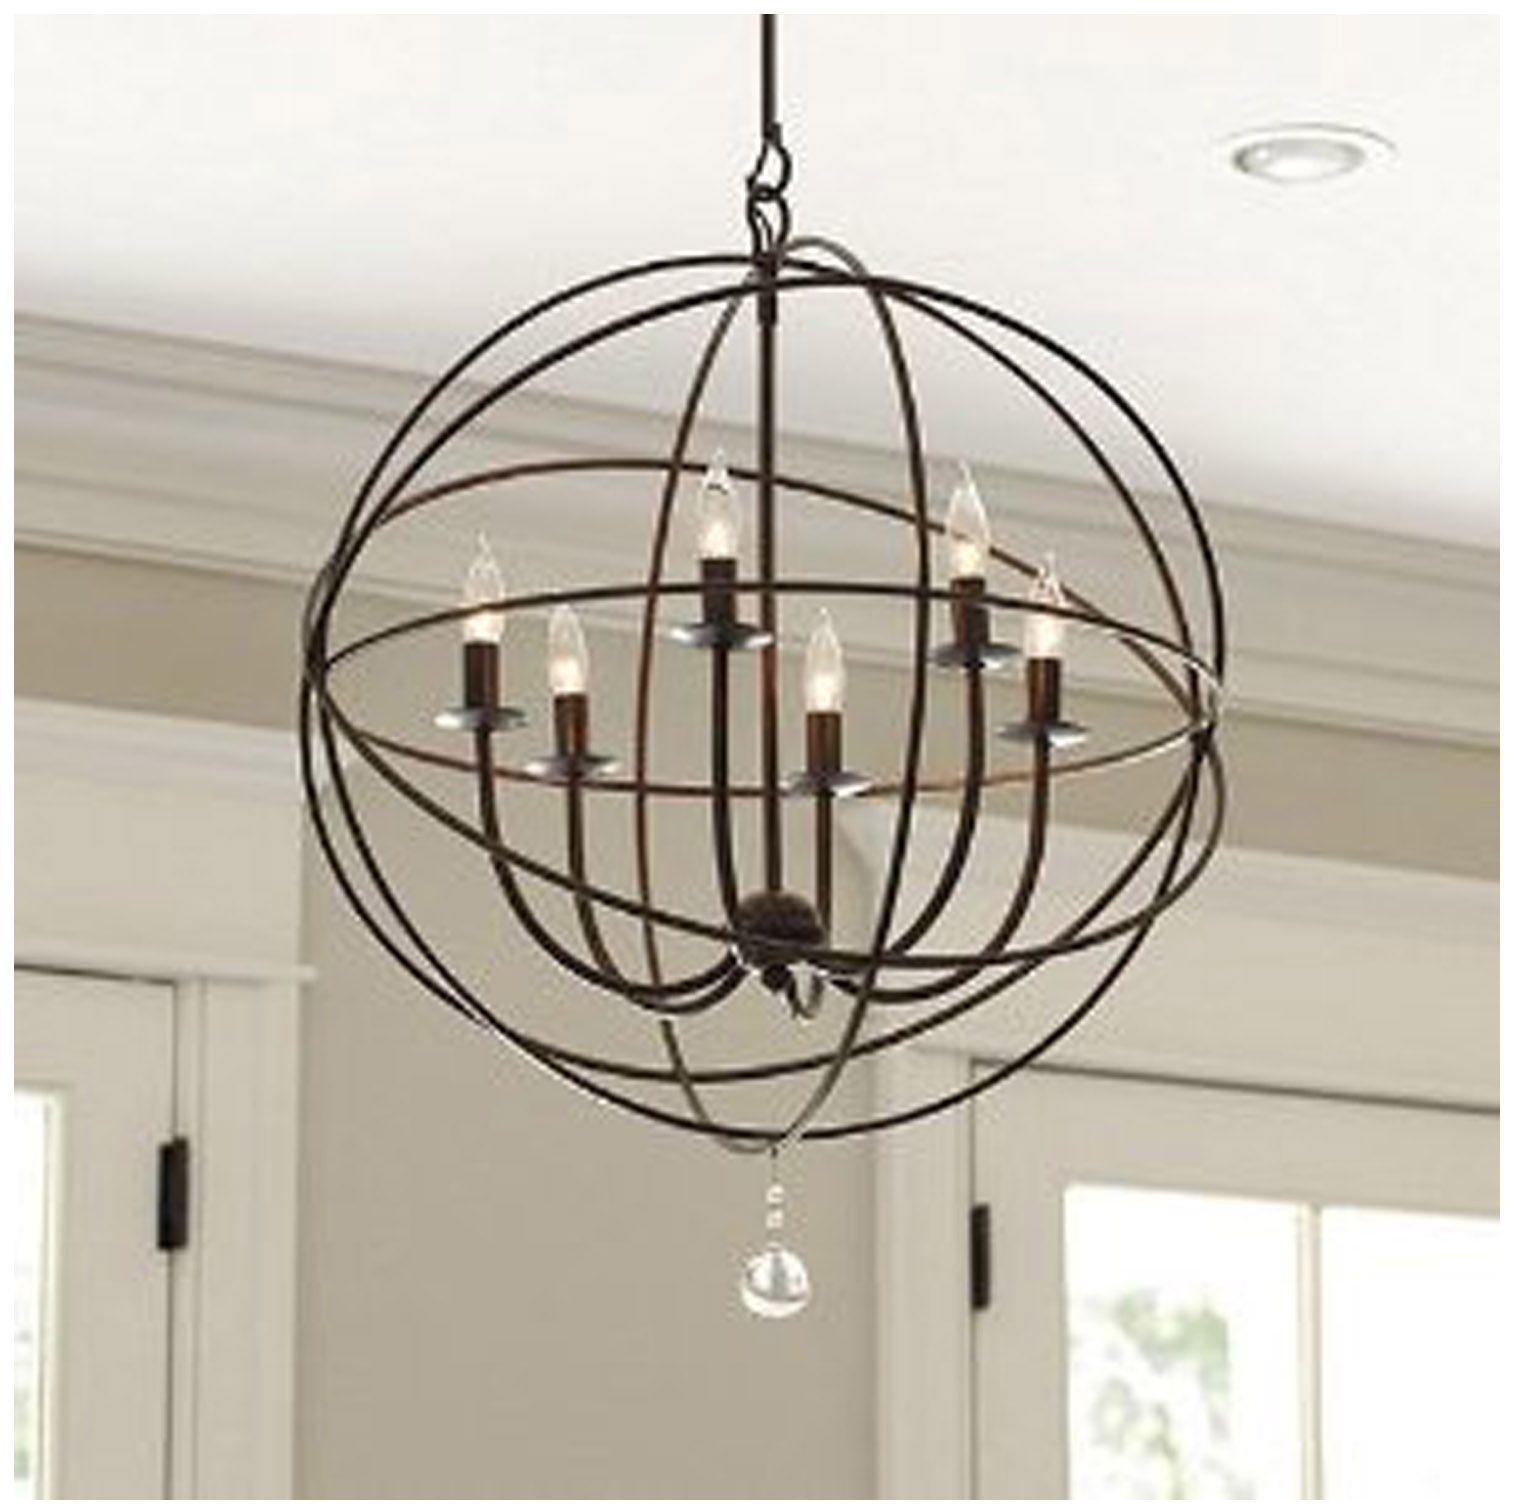 Orb Chandalier By Ballard Designs Pendant Bronze Sphere Orb Chandelier Orb Light Orb Light Fixture